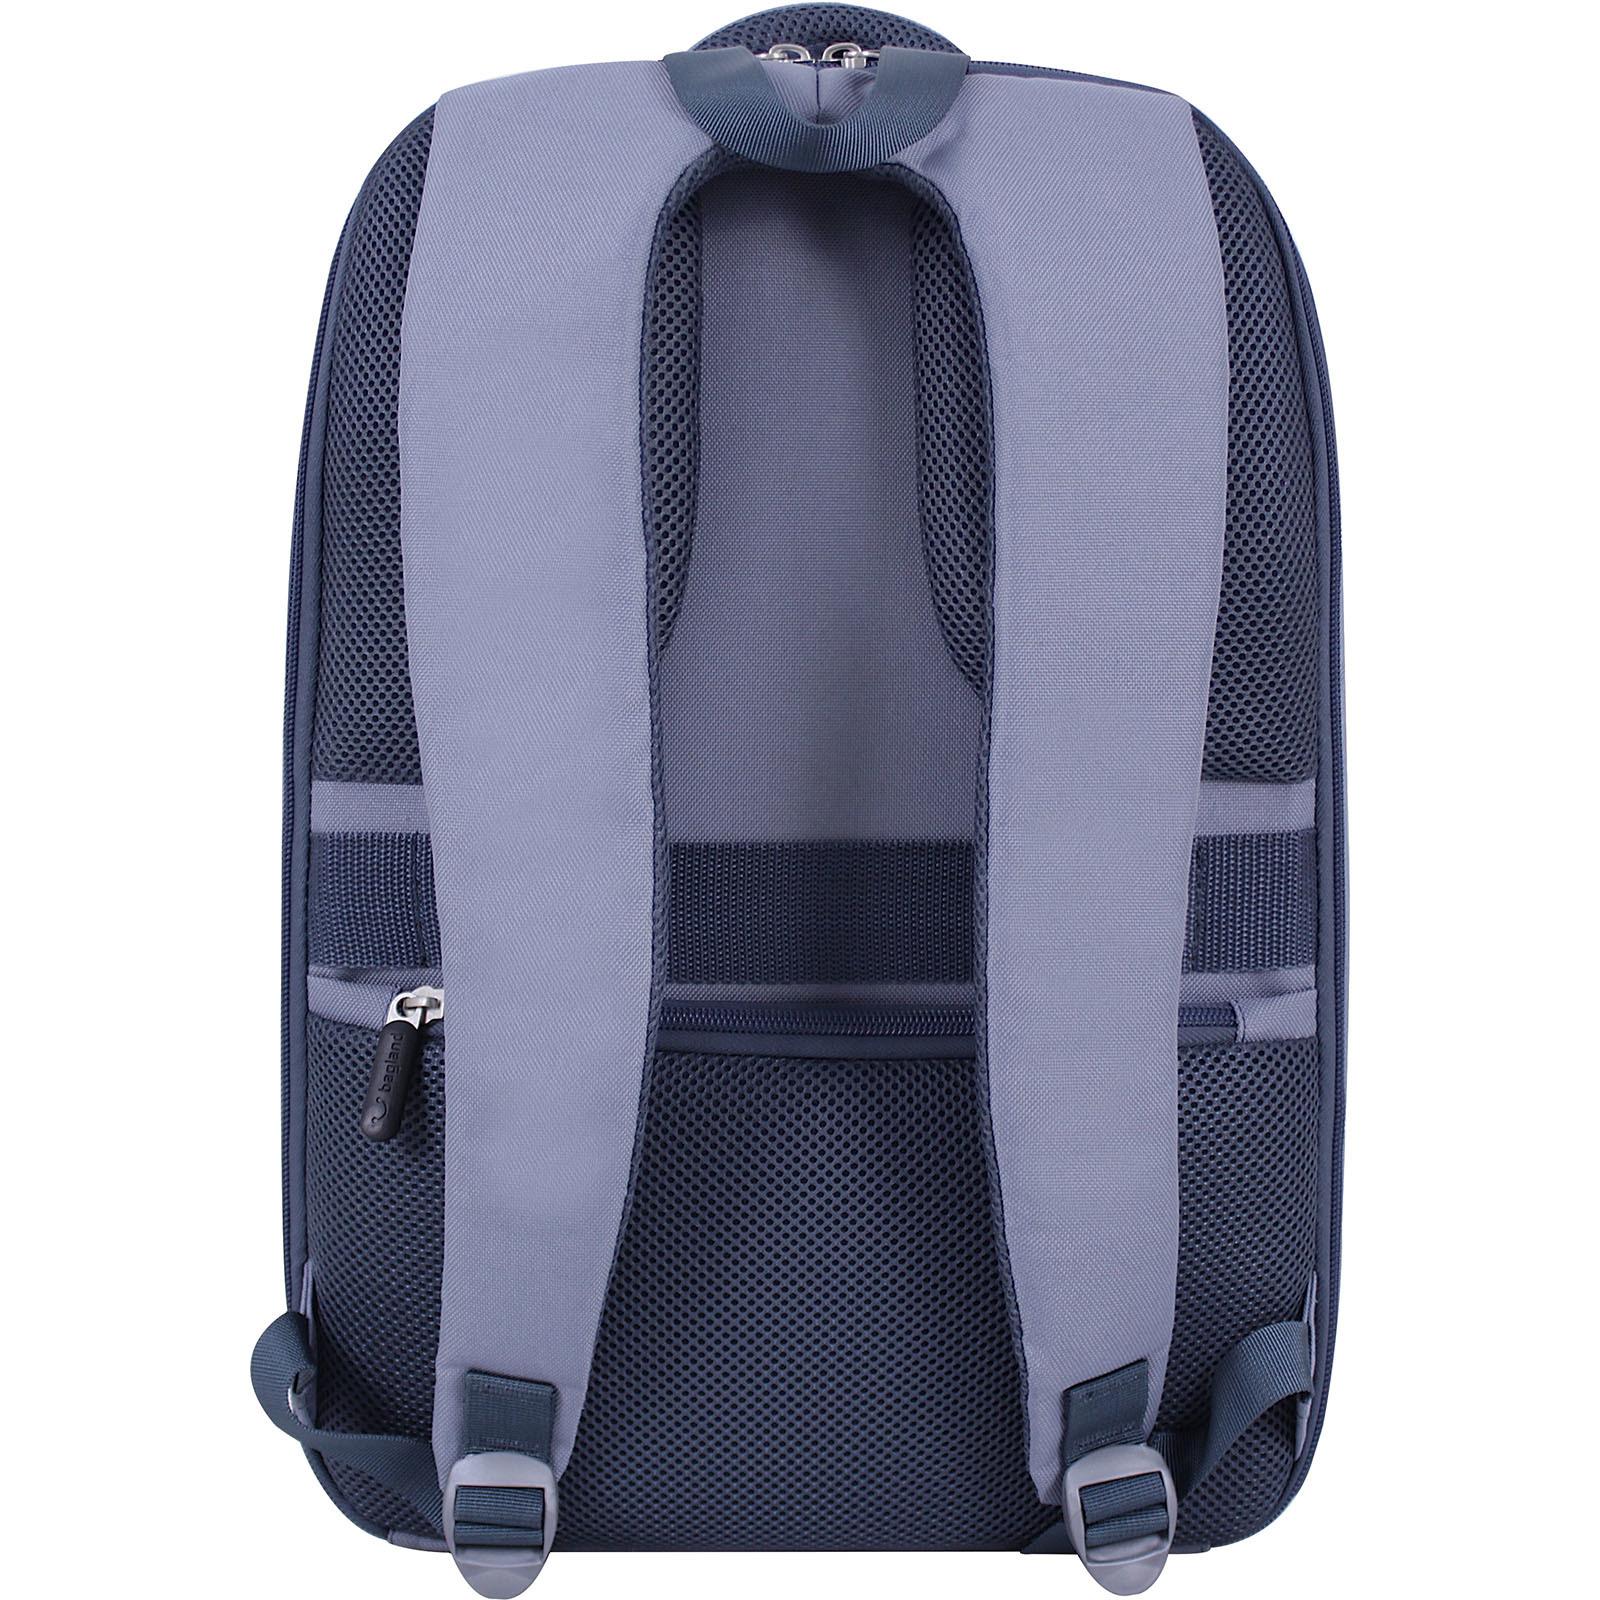 Рюкзак для ноутбука Bagland Shine 16 л. Серый (0058166) фото 3